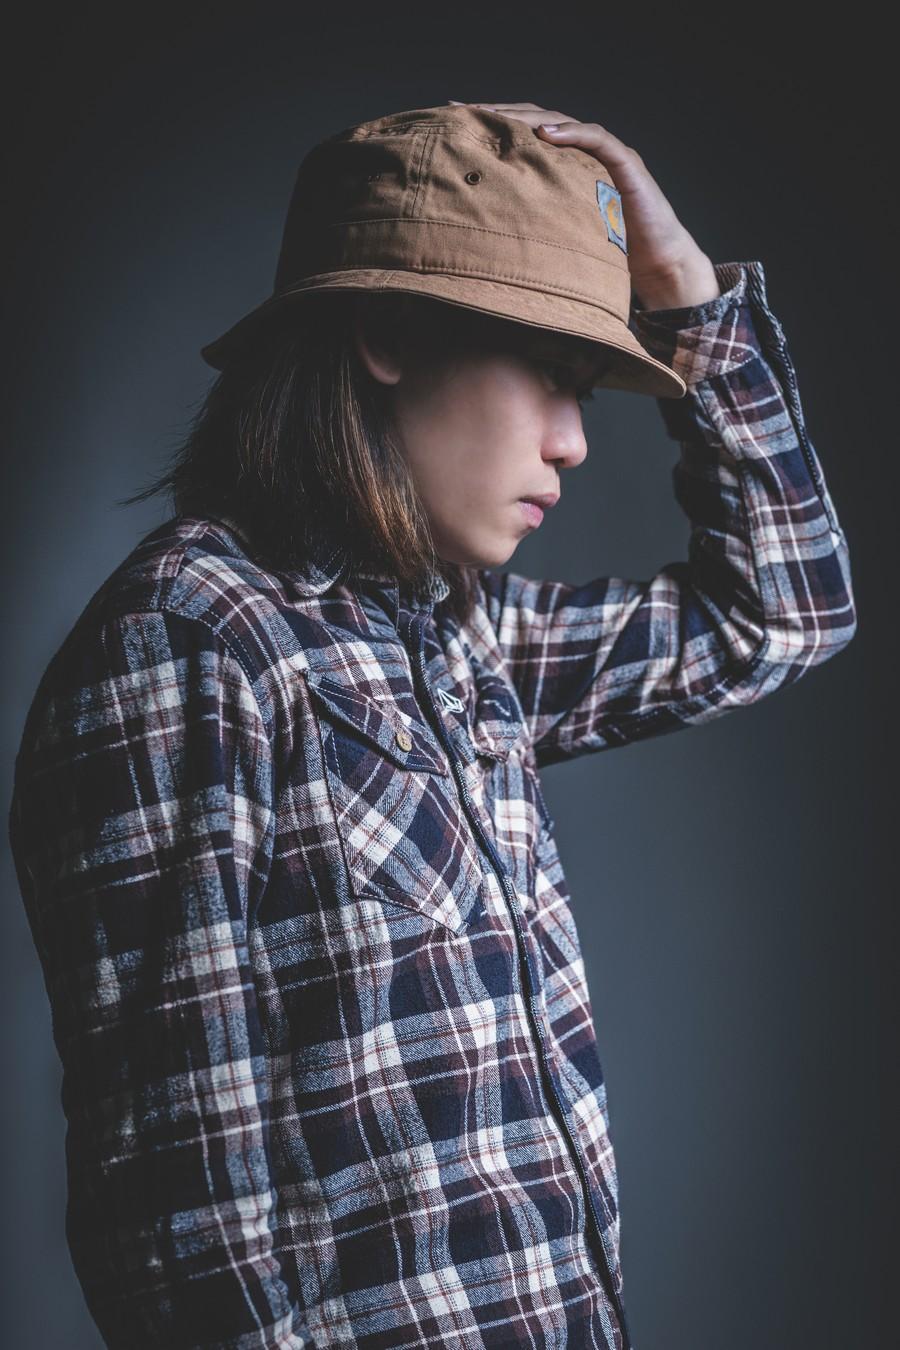 plaid,light,photography,tartan,headgear